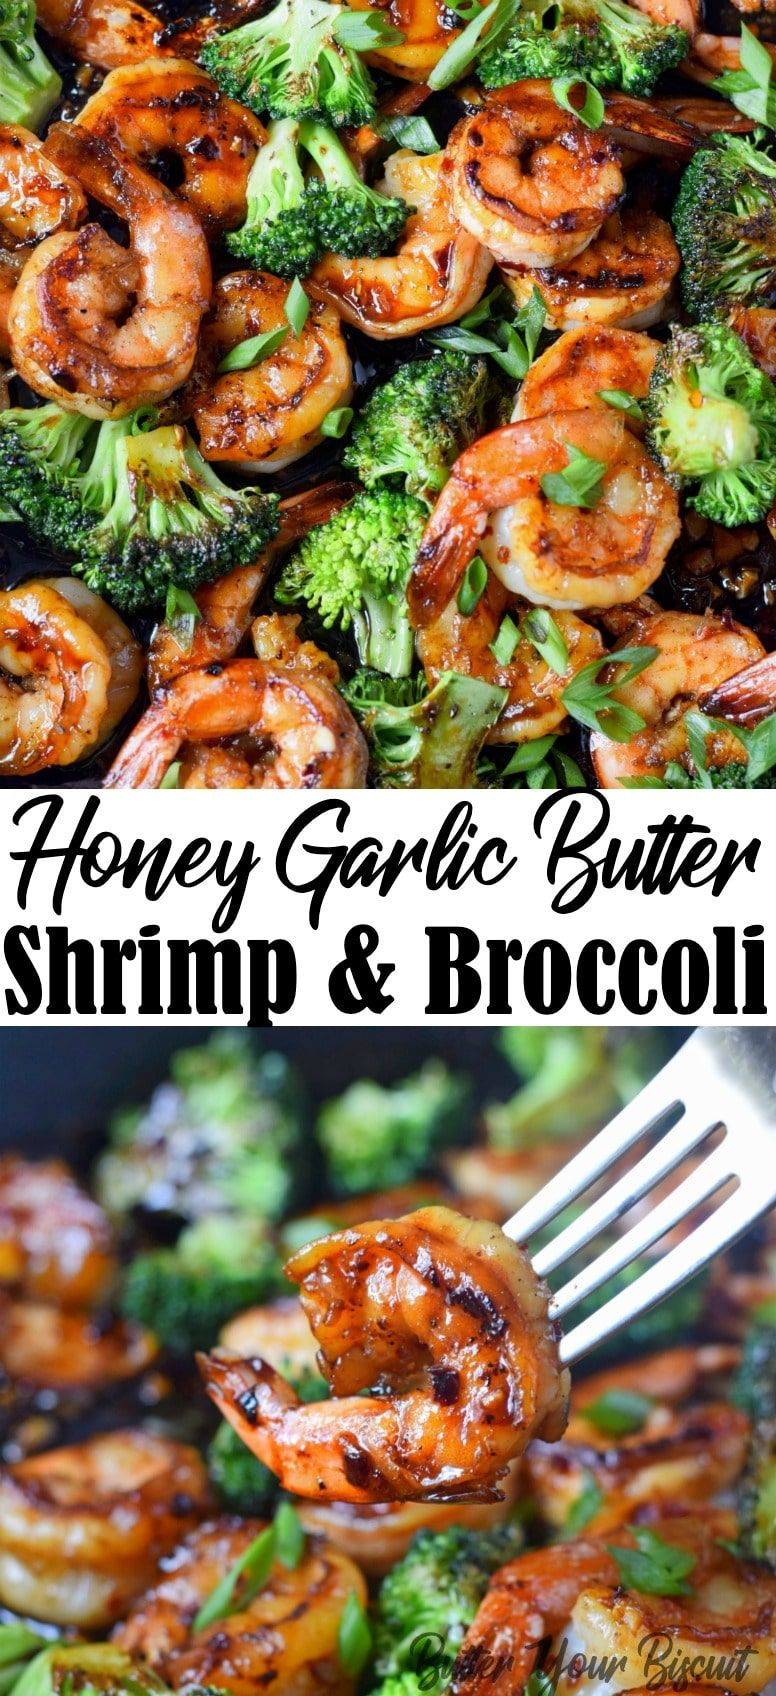 Honey Garlic Butter Shrimp & Broccoli - Butter Your Biscuit